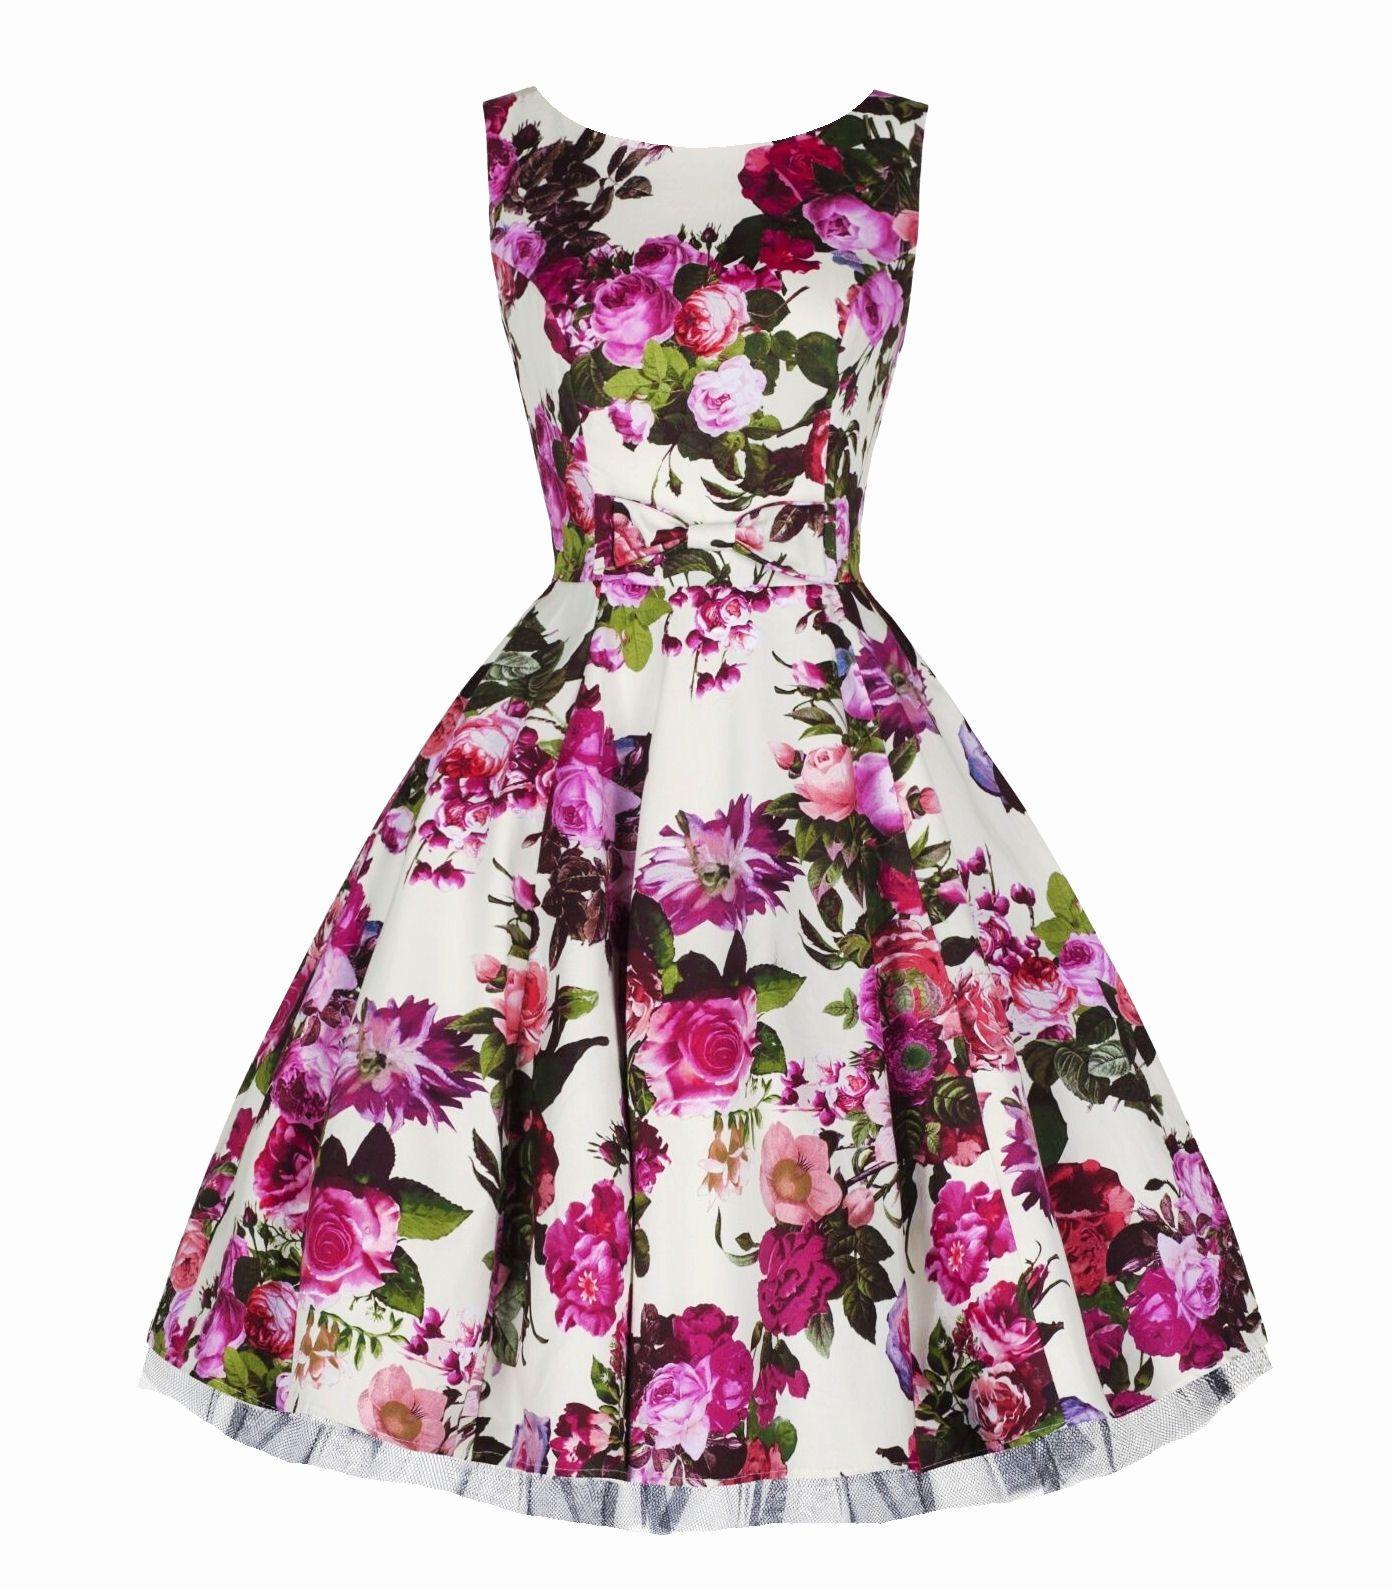 H Amp R London Audrey Pink Floral Swing Dress Vintage